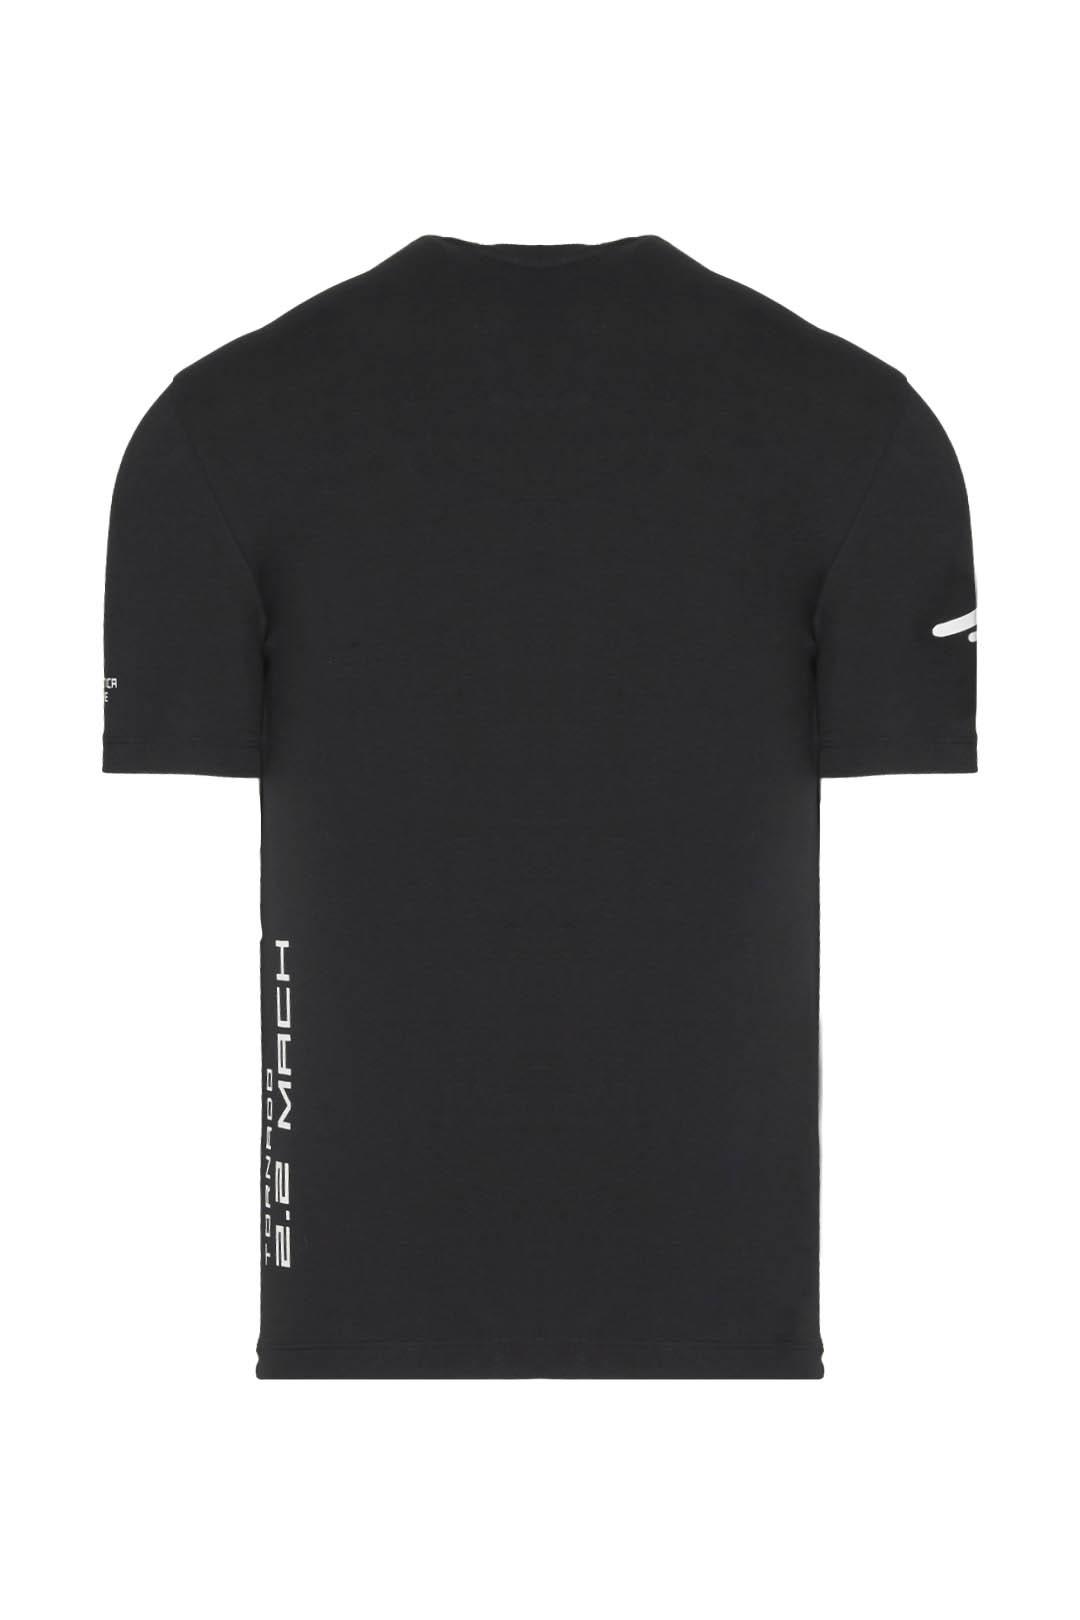 T-Shirt mit Adler Kontrastdruck          2